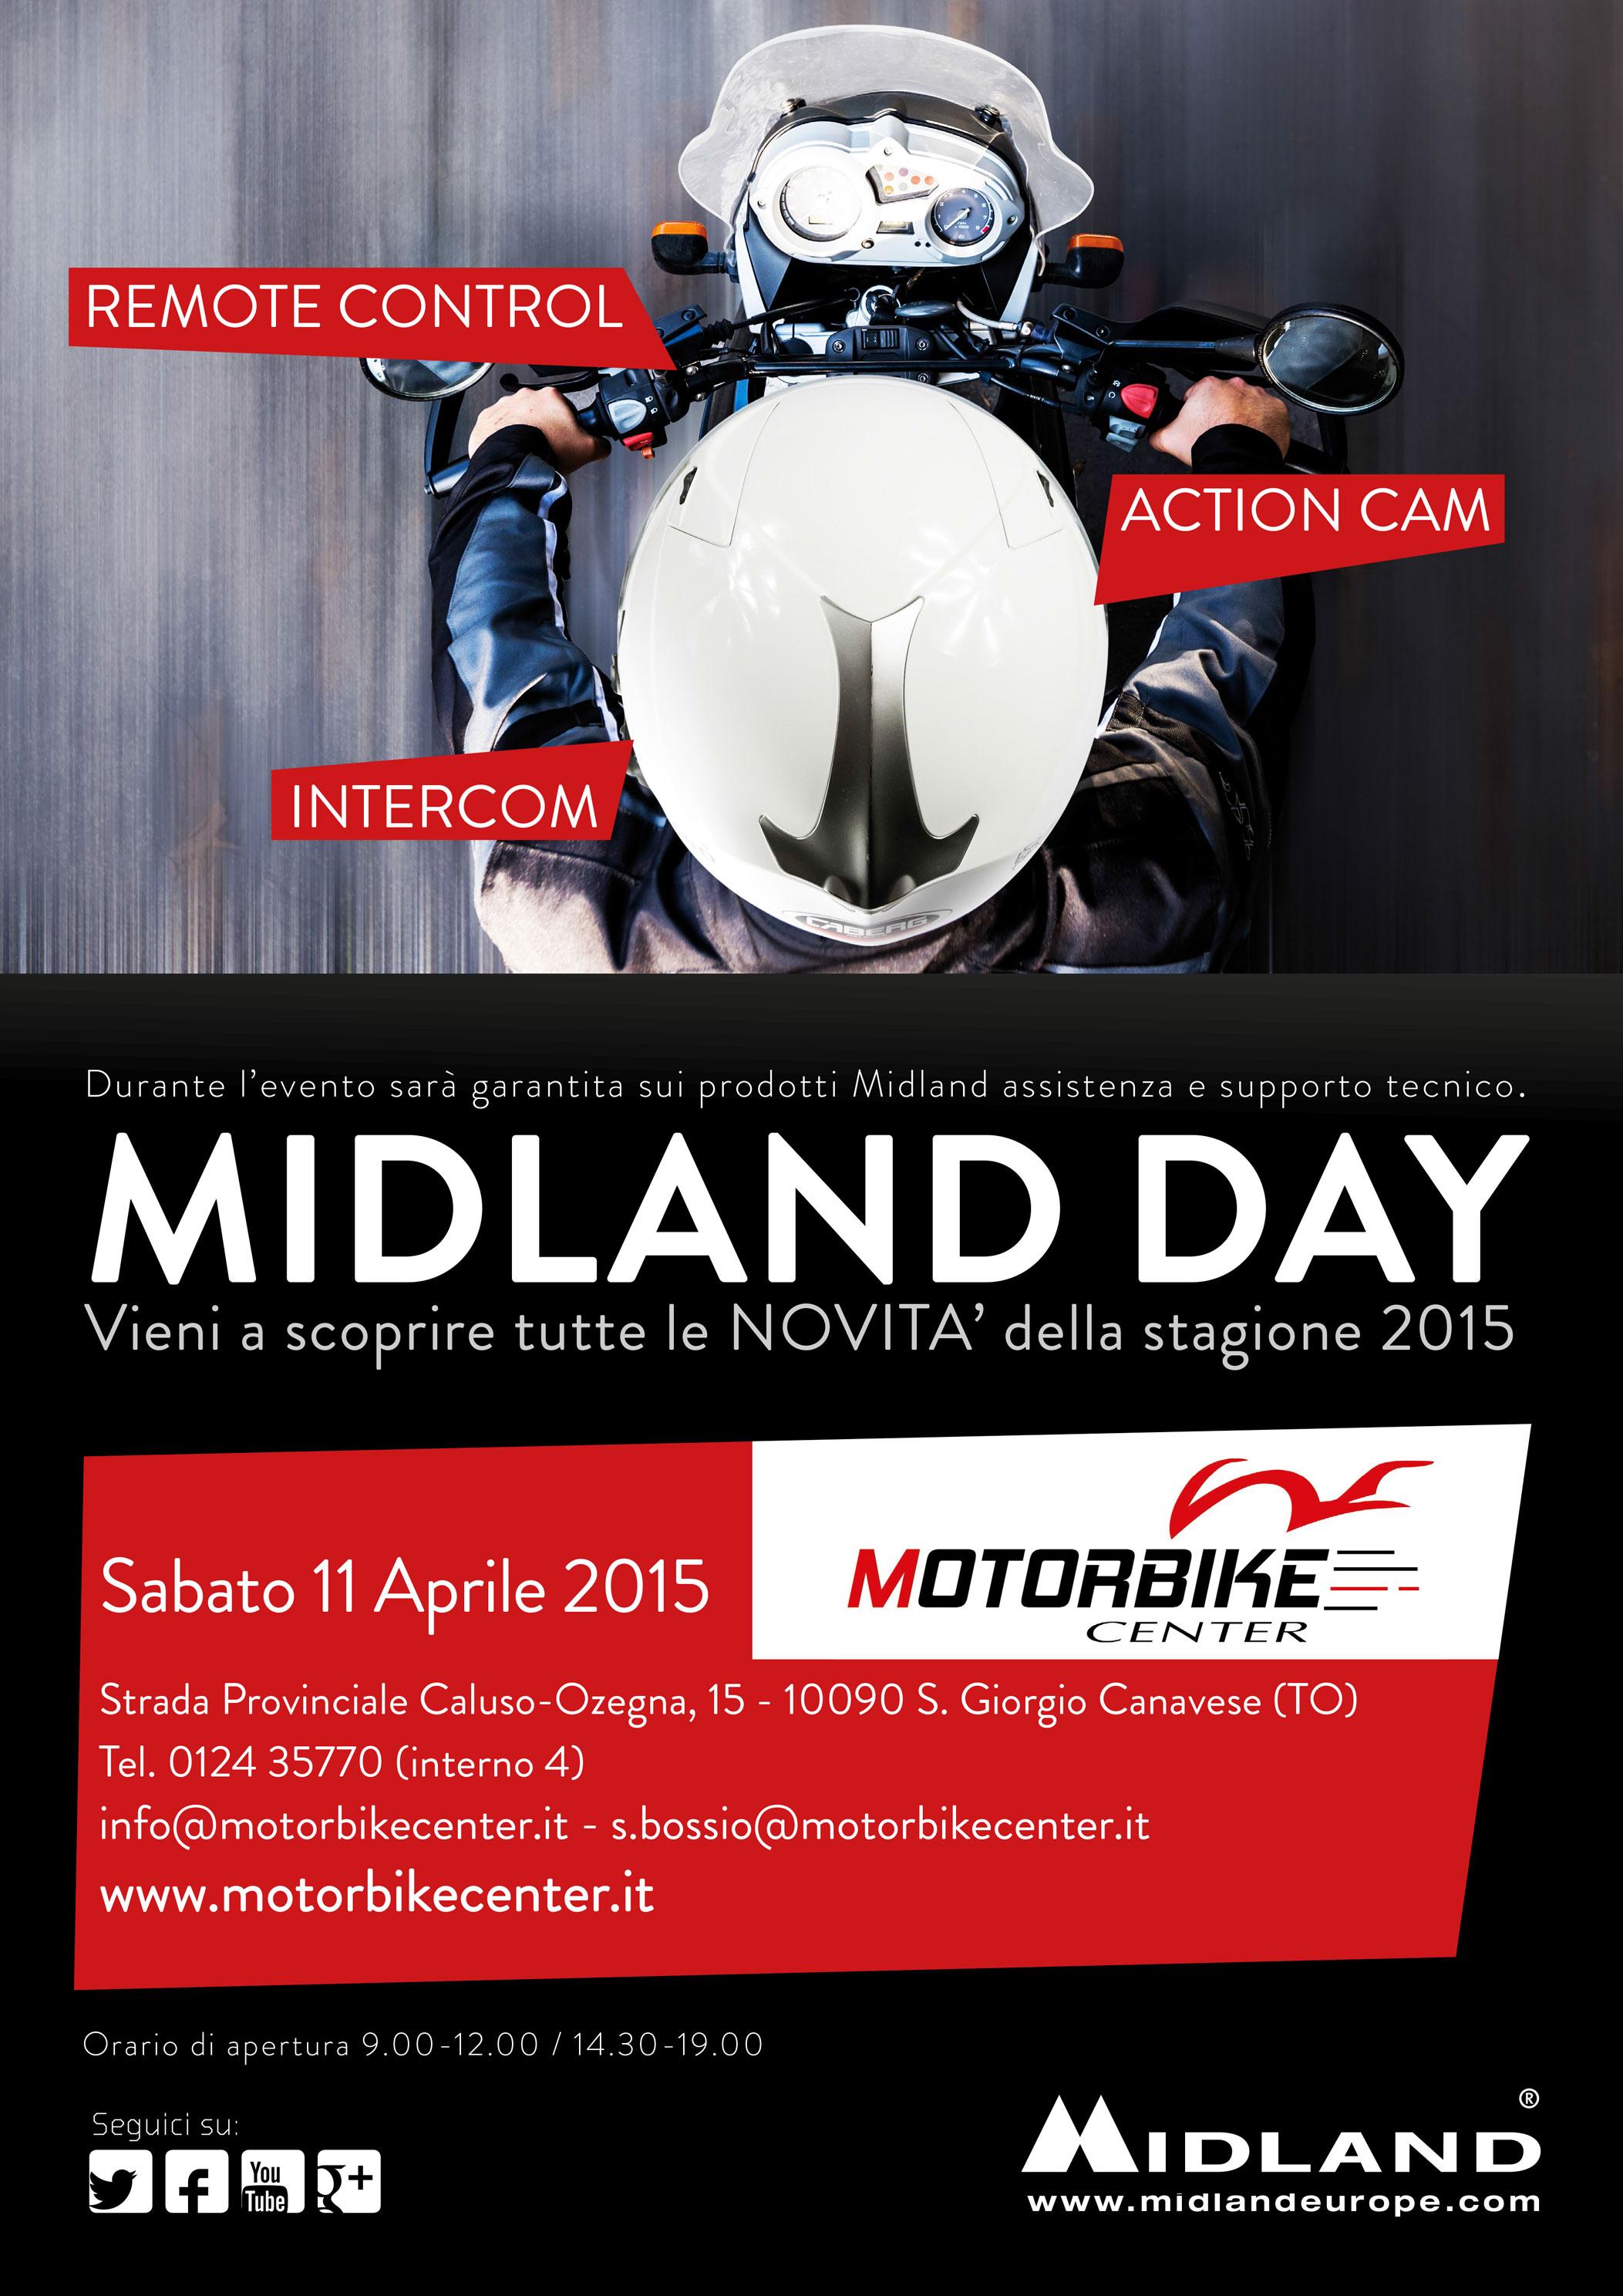 442557_motorbike-center-11-aprile